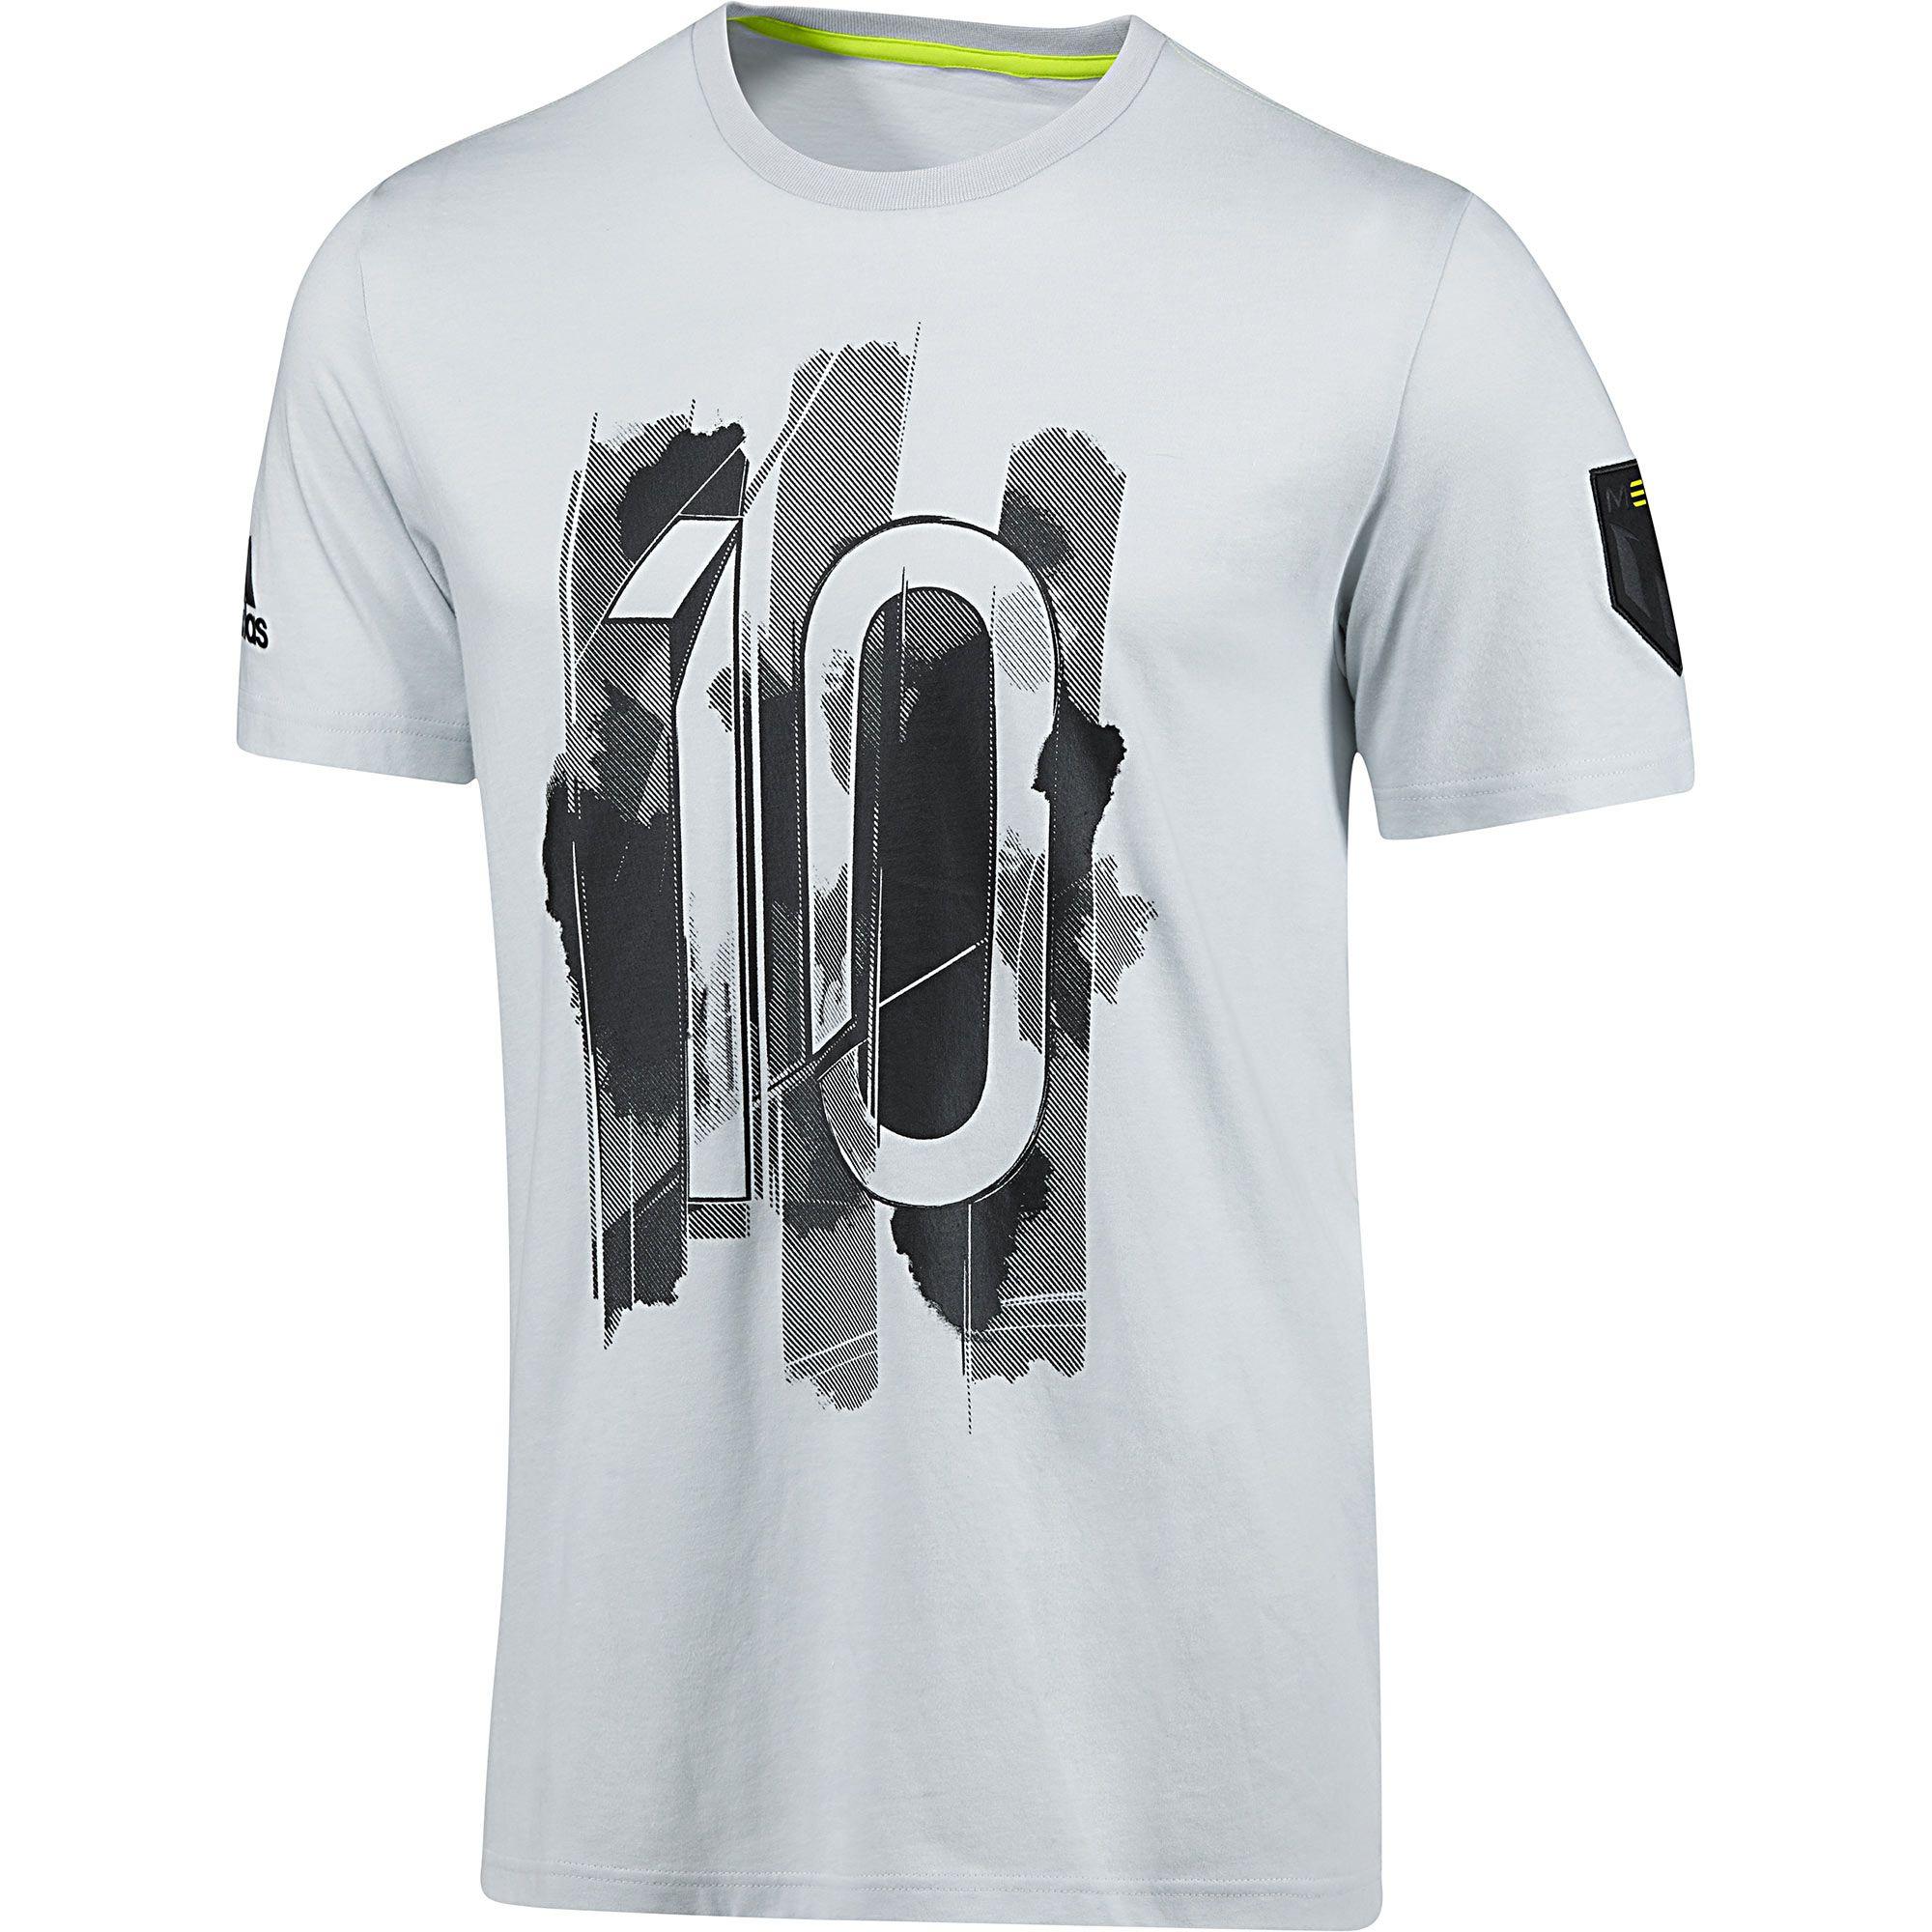 Messi T Shirt In G 2019 Design Tee Adidas 10Regional vbfyY67g